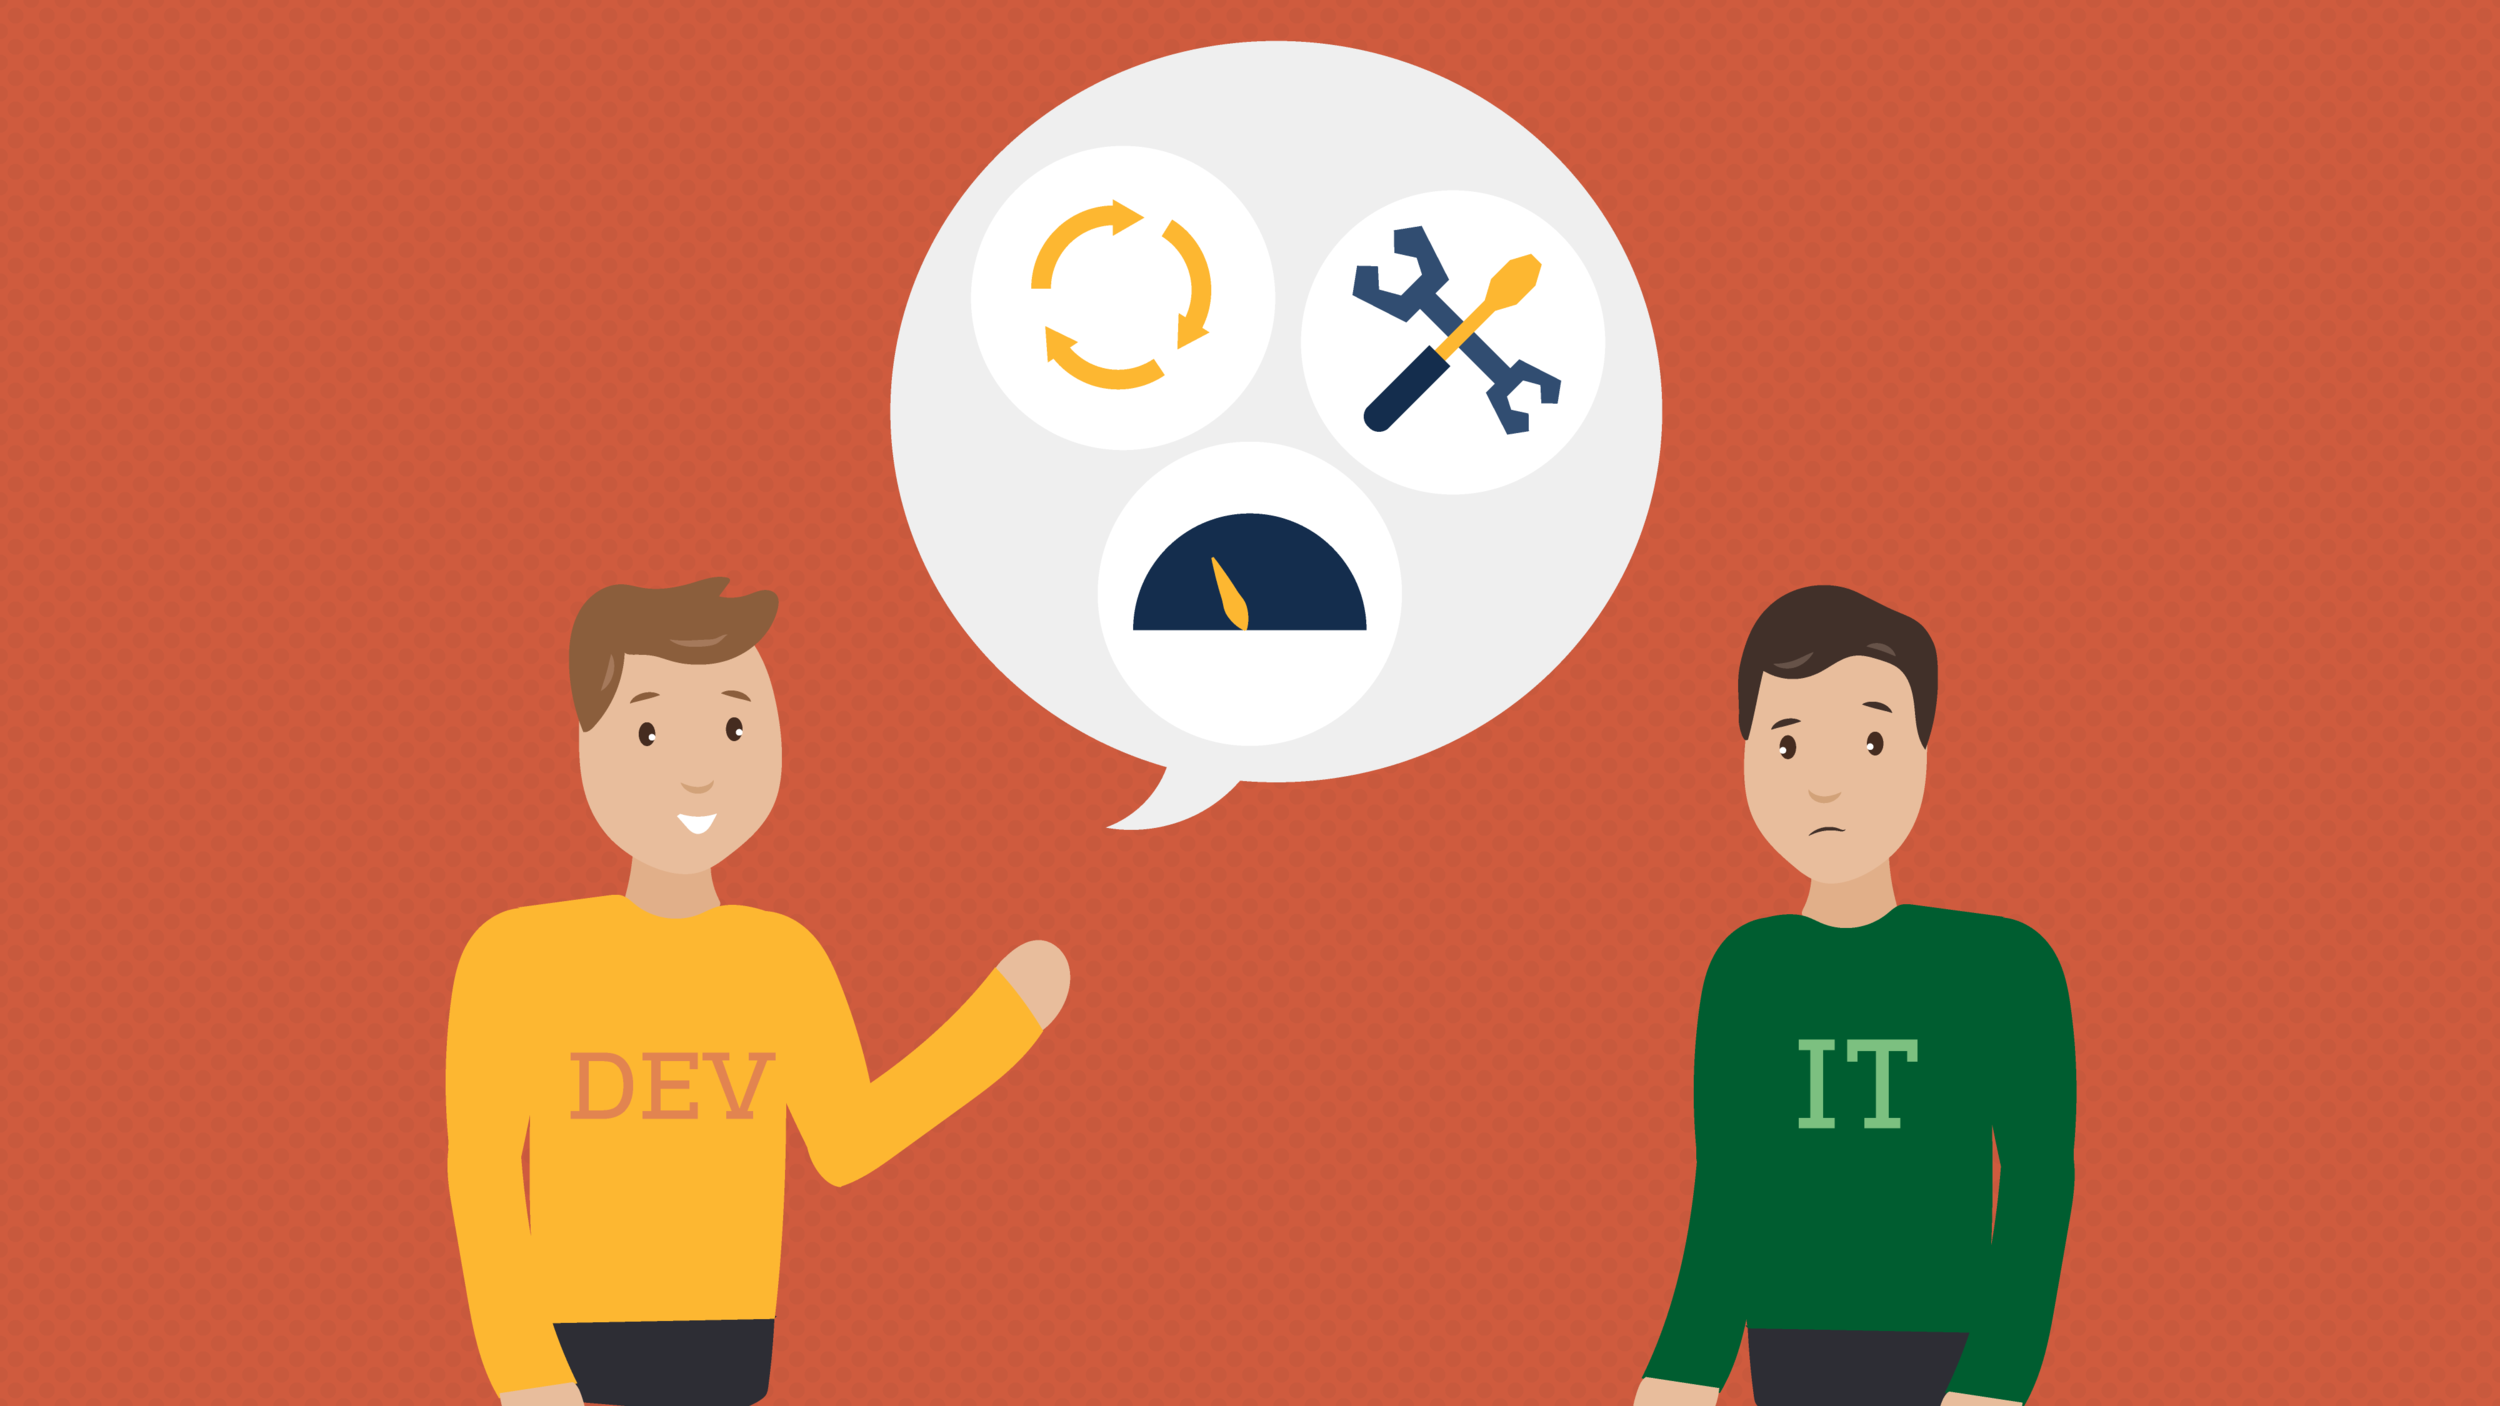 dev-team-talking-to-IT.png